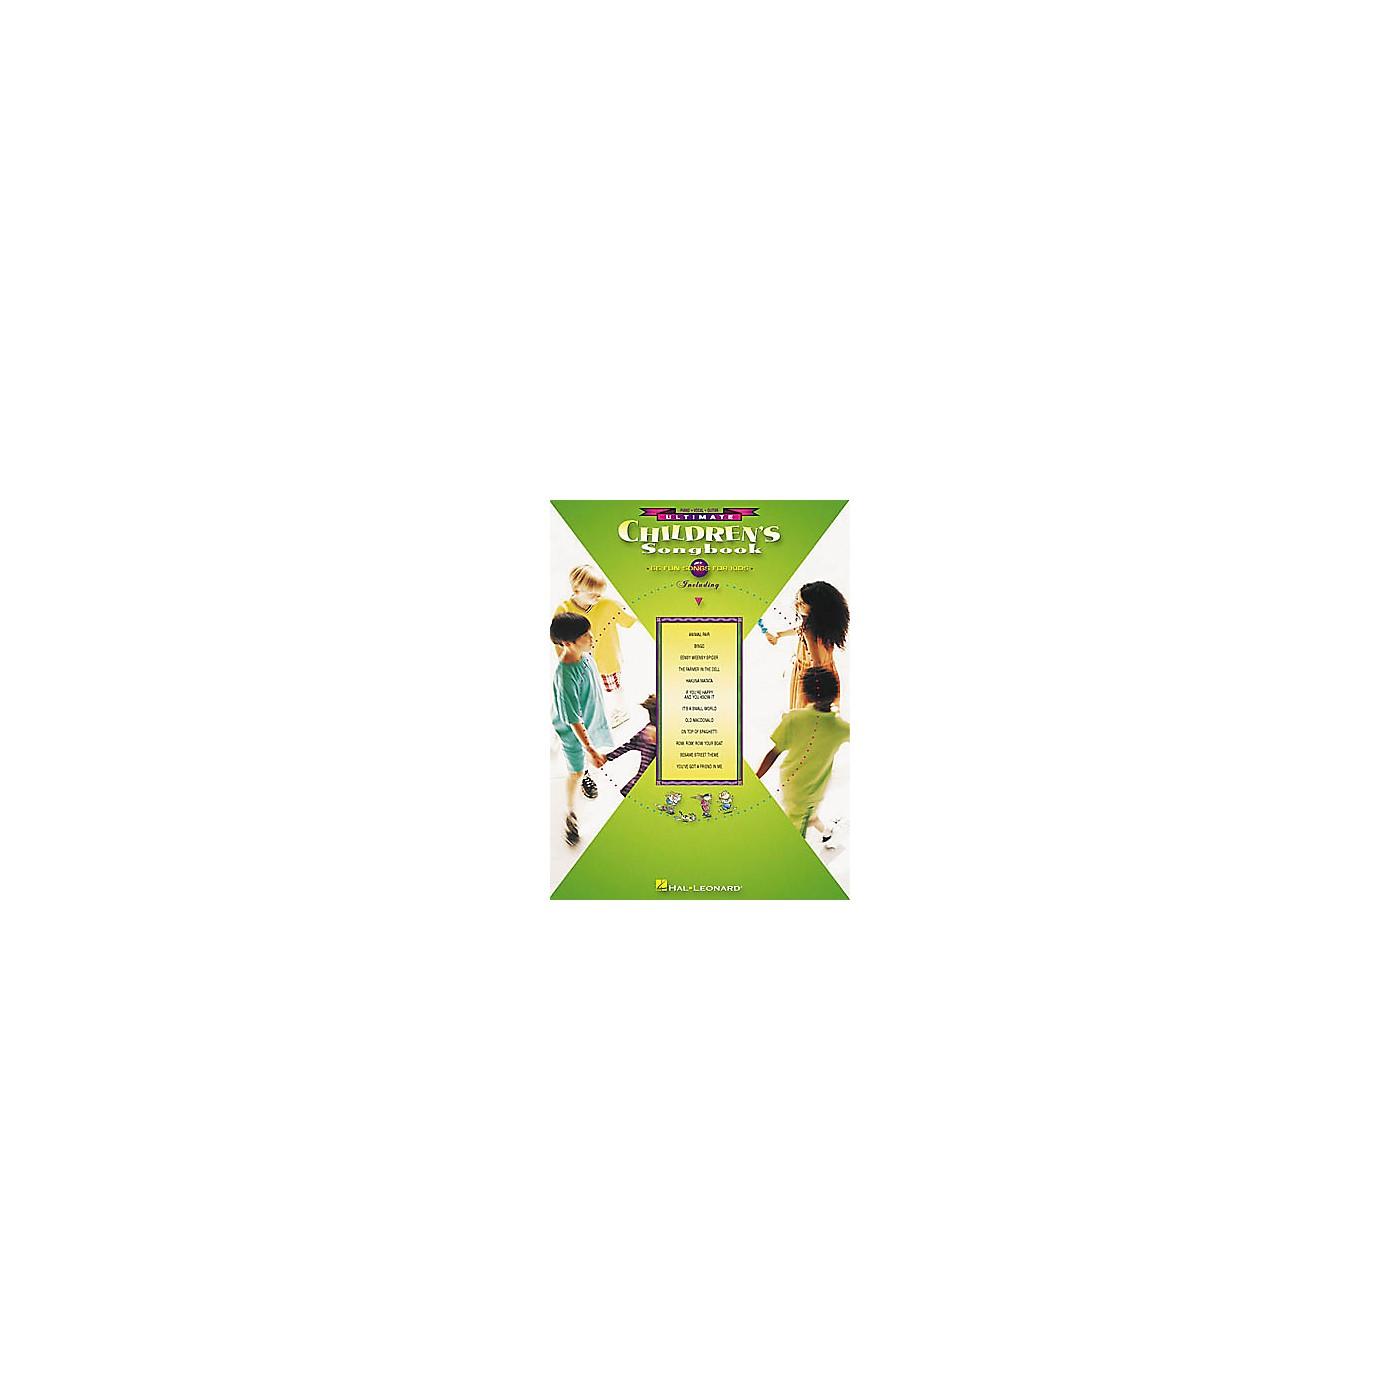 Hal Leonard Ultimate Children's Piano/Vocal/Guitar Songbook thumbnail